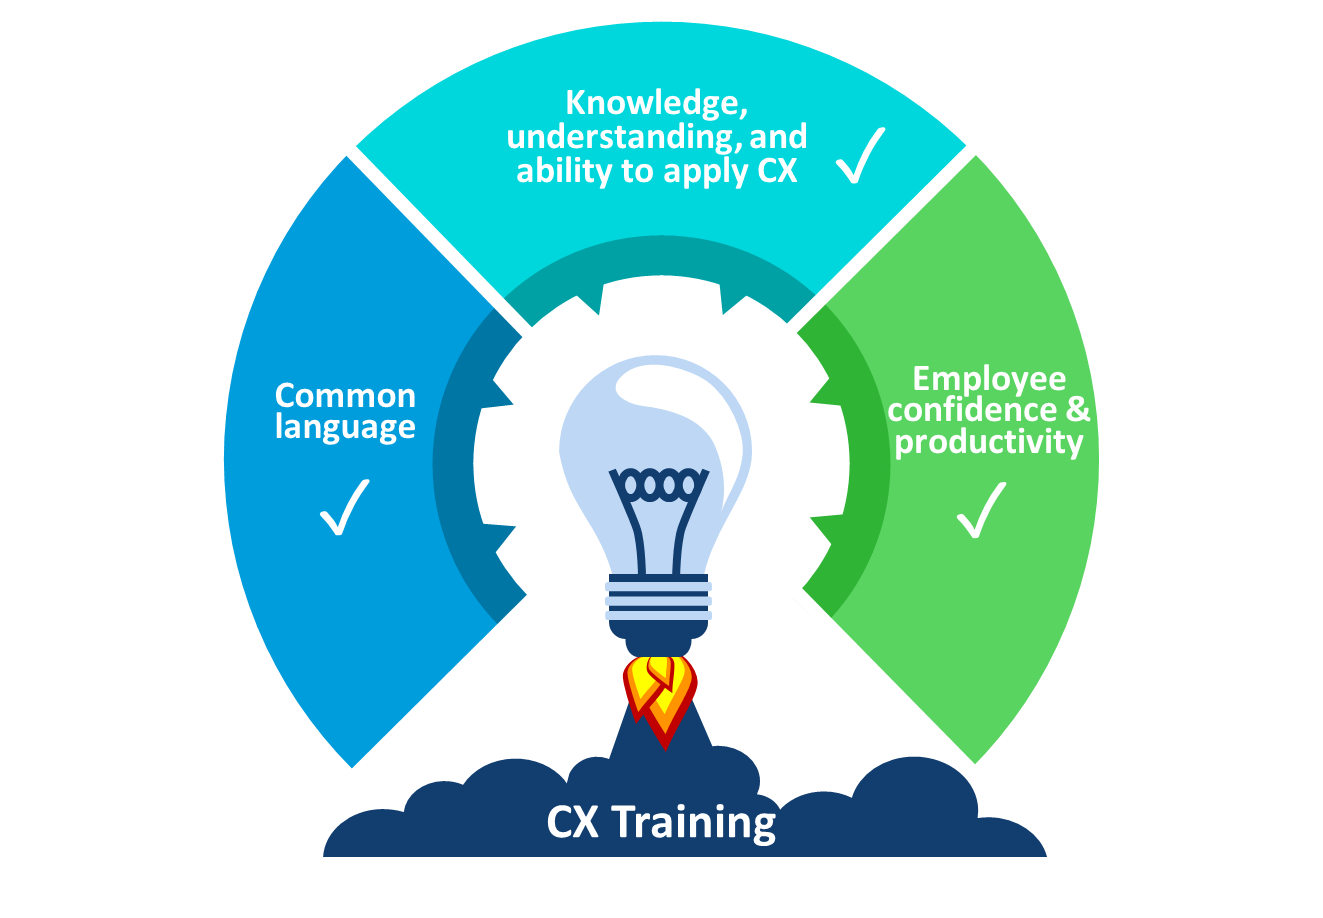 CX training is essential